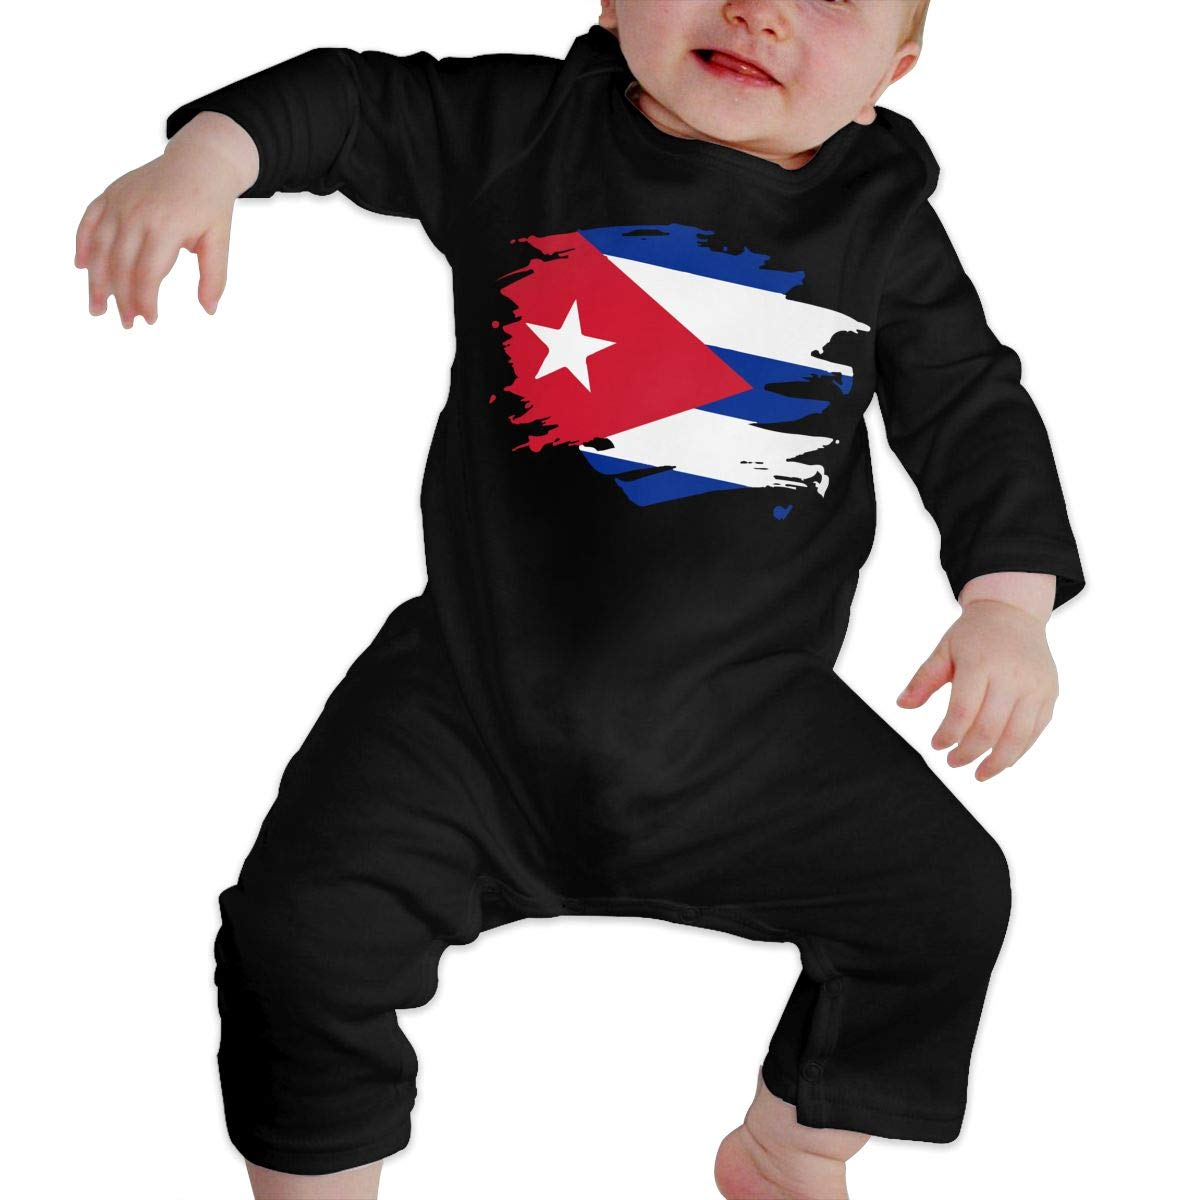 UGFGF-S3 Cuba Paint Splatter Flag Baby Boy Girl Long Sleeve Romper Jumpsuit Toddler Jumpsuit